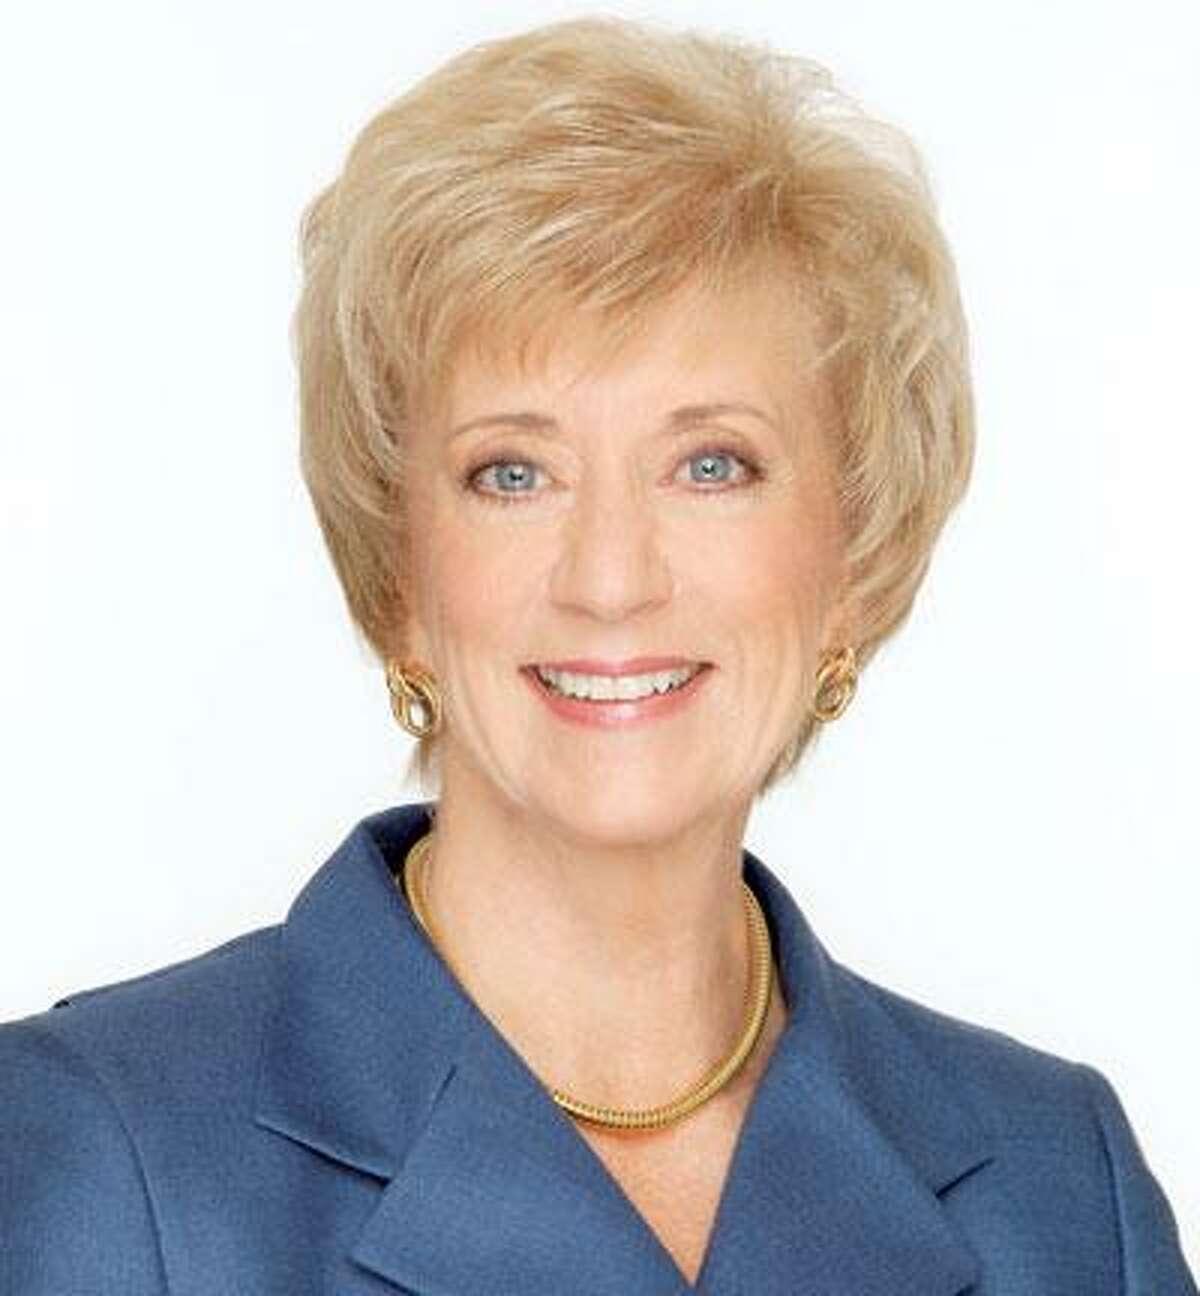 U.S. Senate candidate Linda McMahon